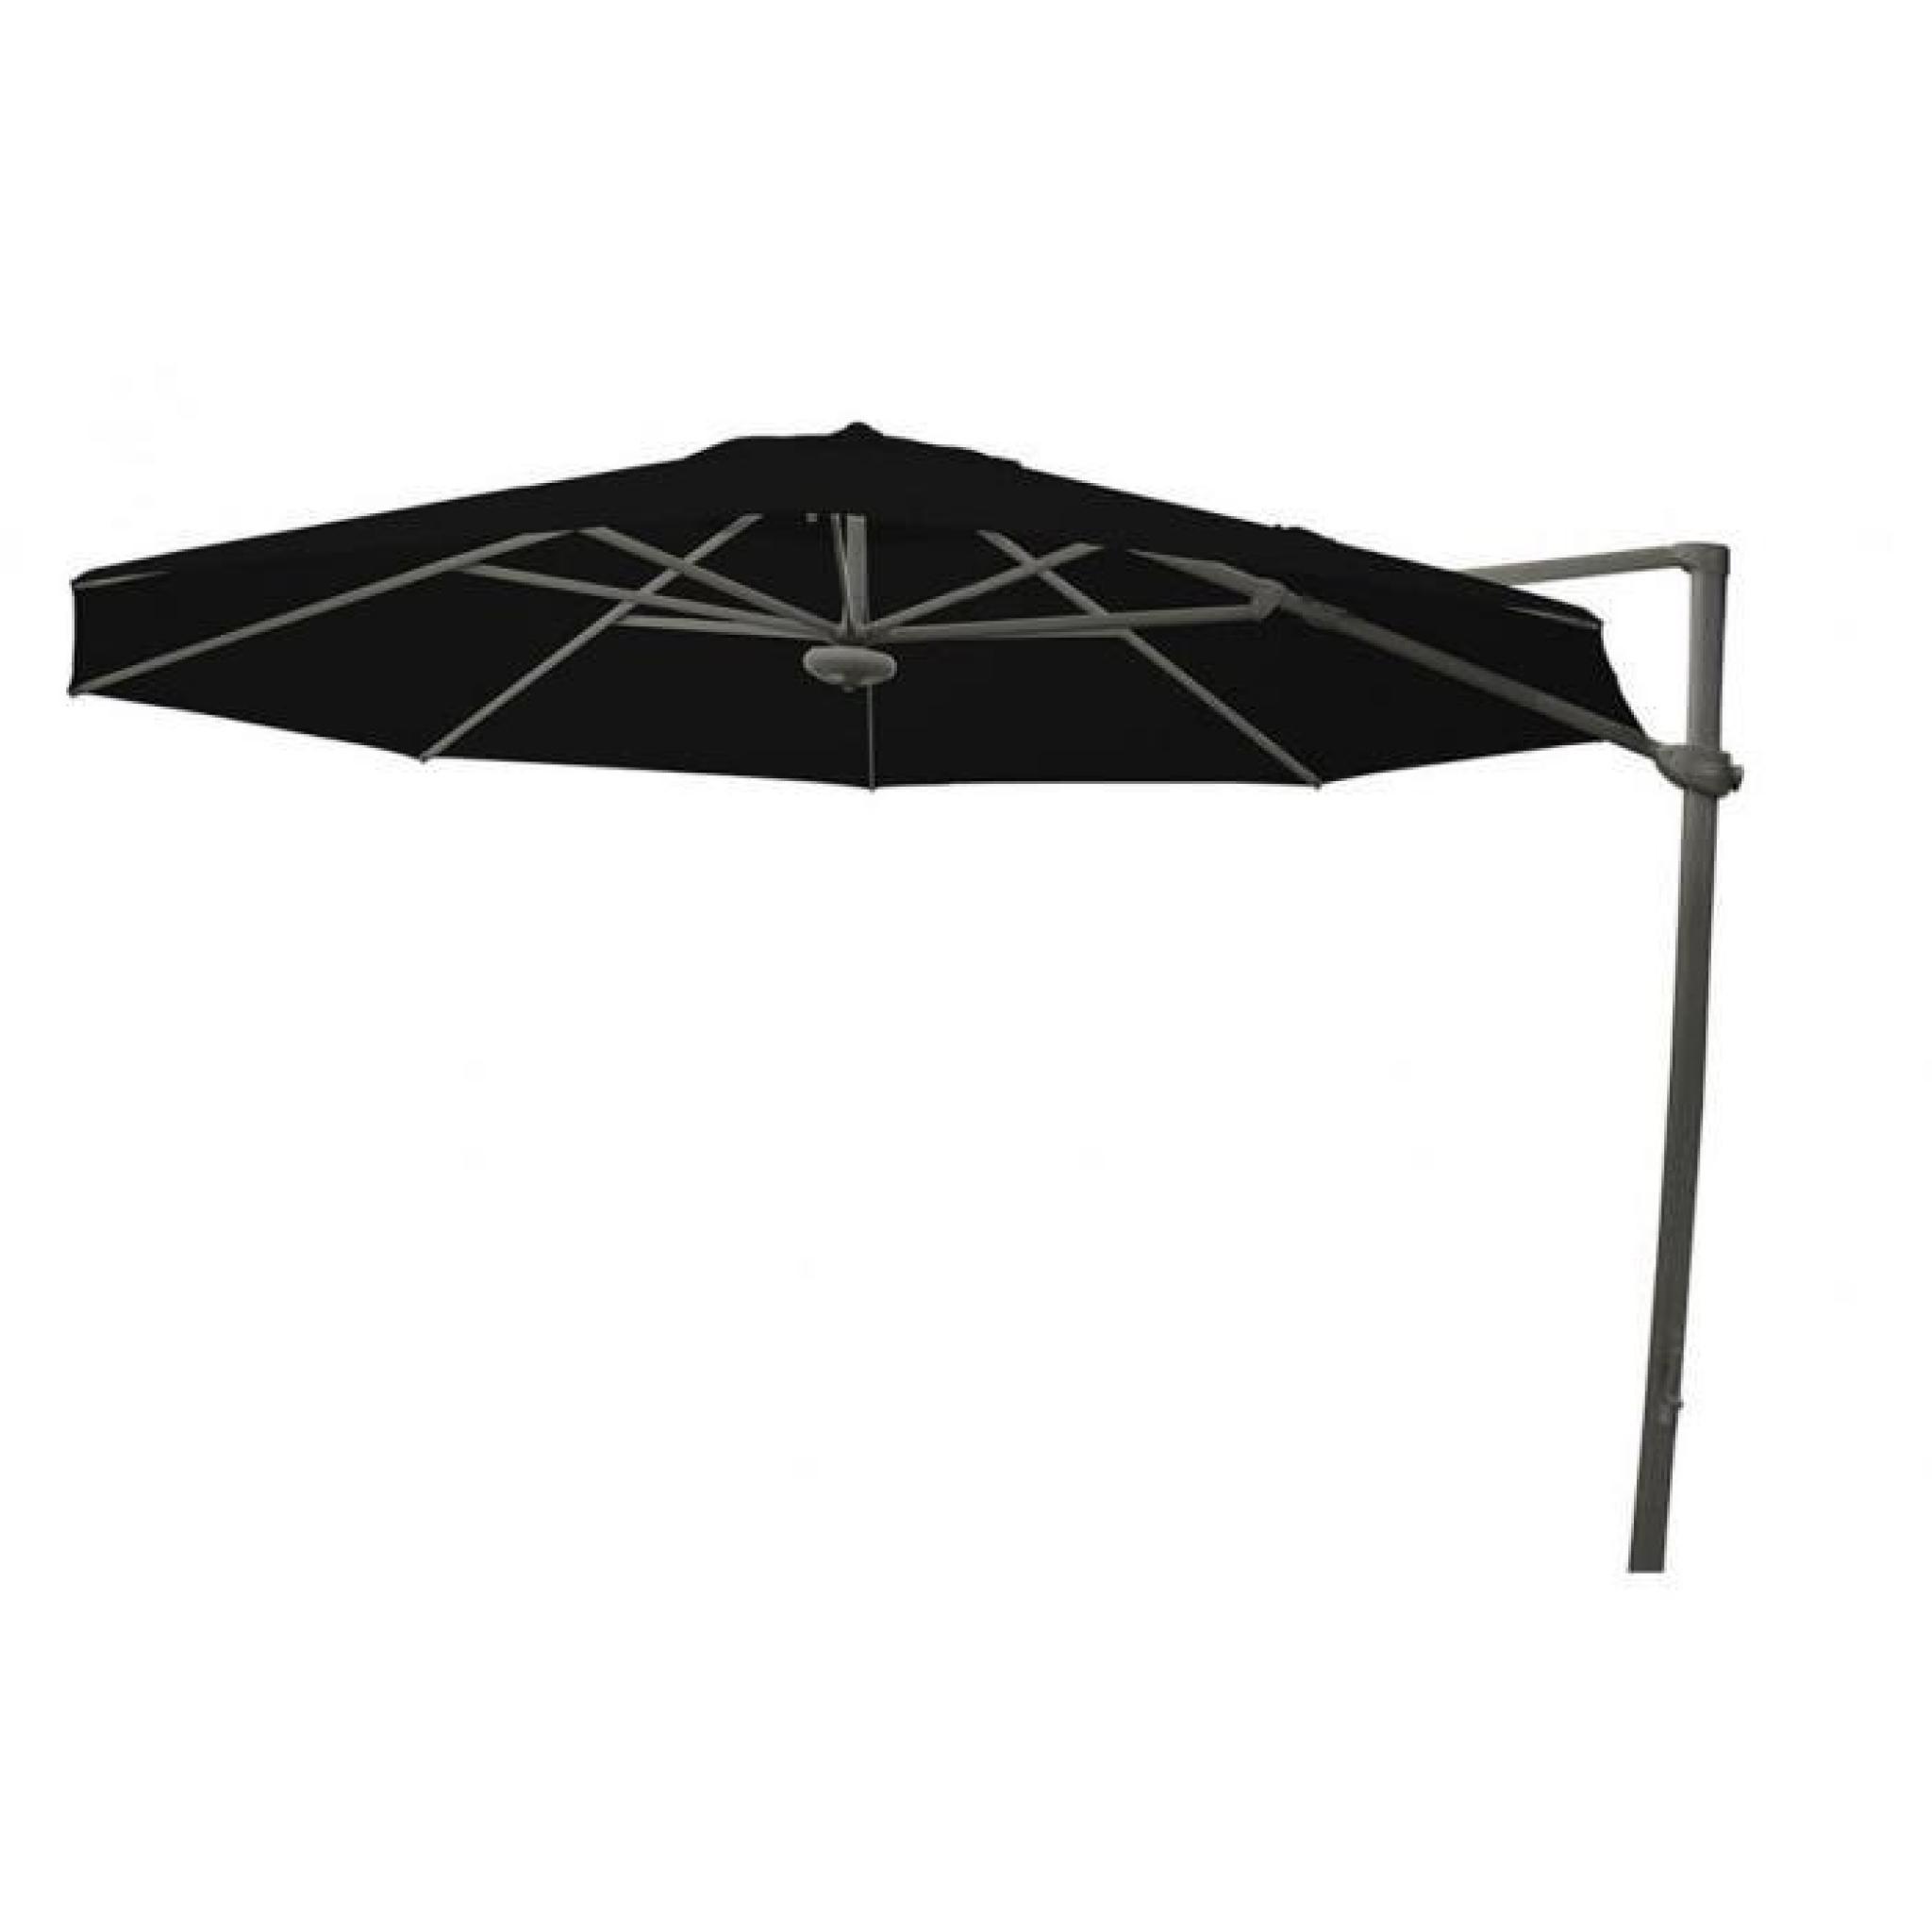 achat parasol affordable parasol biarritz parasol aluminium dport x m polyeste with achat. Black Bedroom Furniture Sets. Home Design Ideas